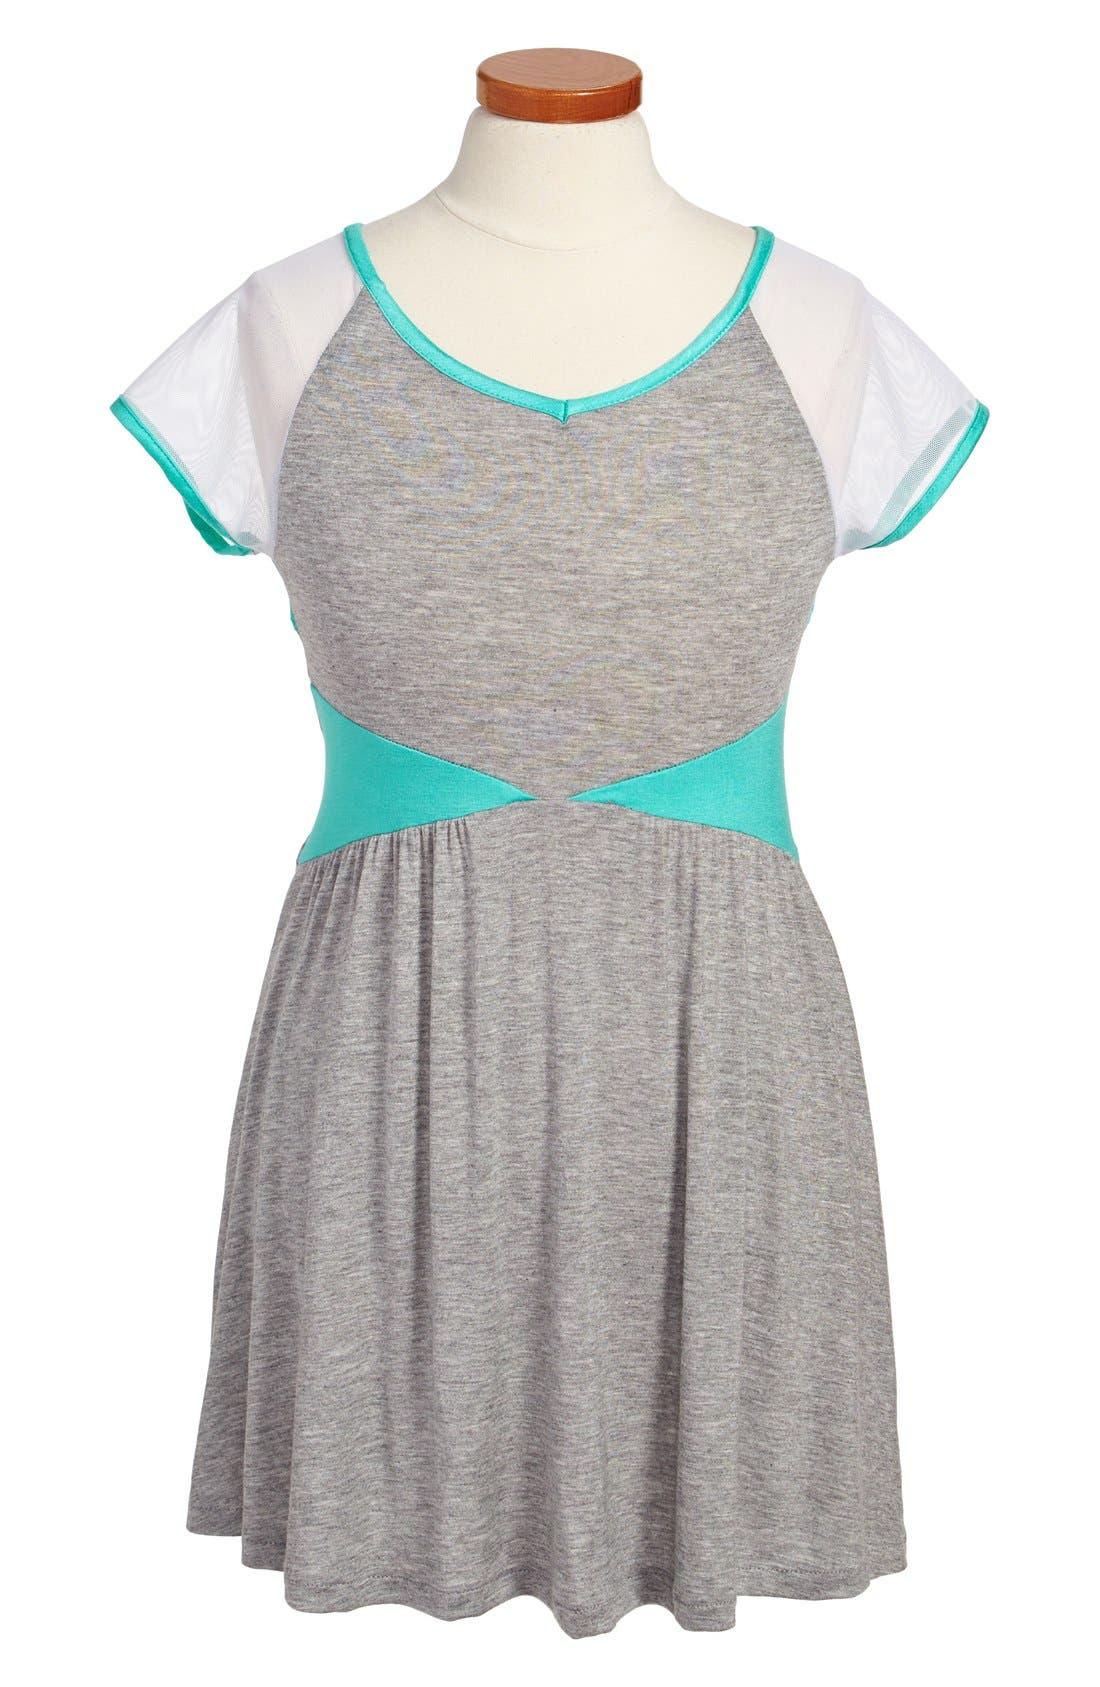 Alternate Image 1 Selected - Sally Miller Cutout Dress (Big Girls)